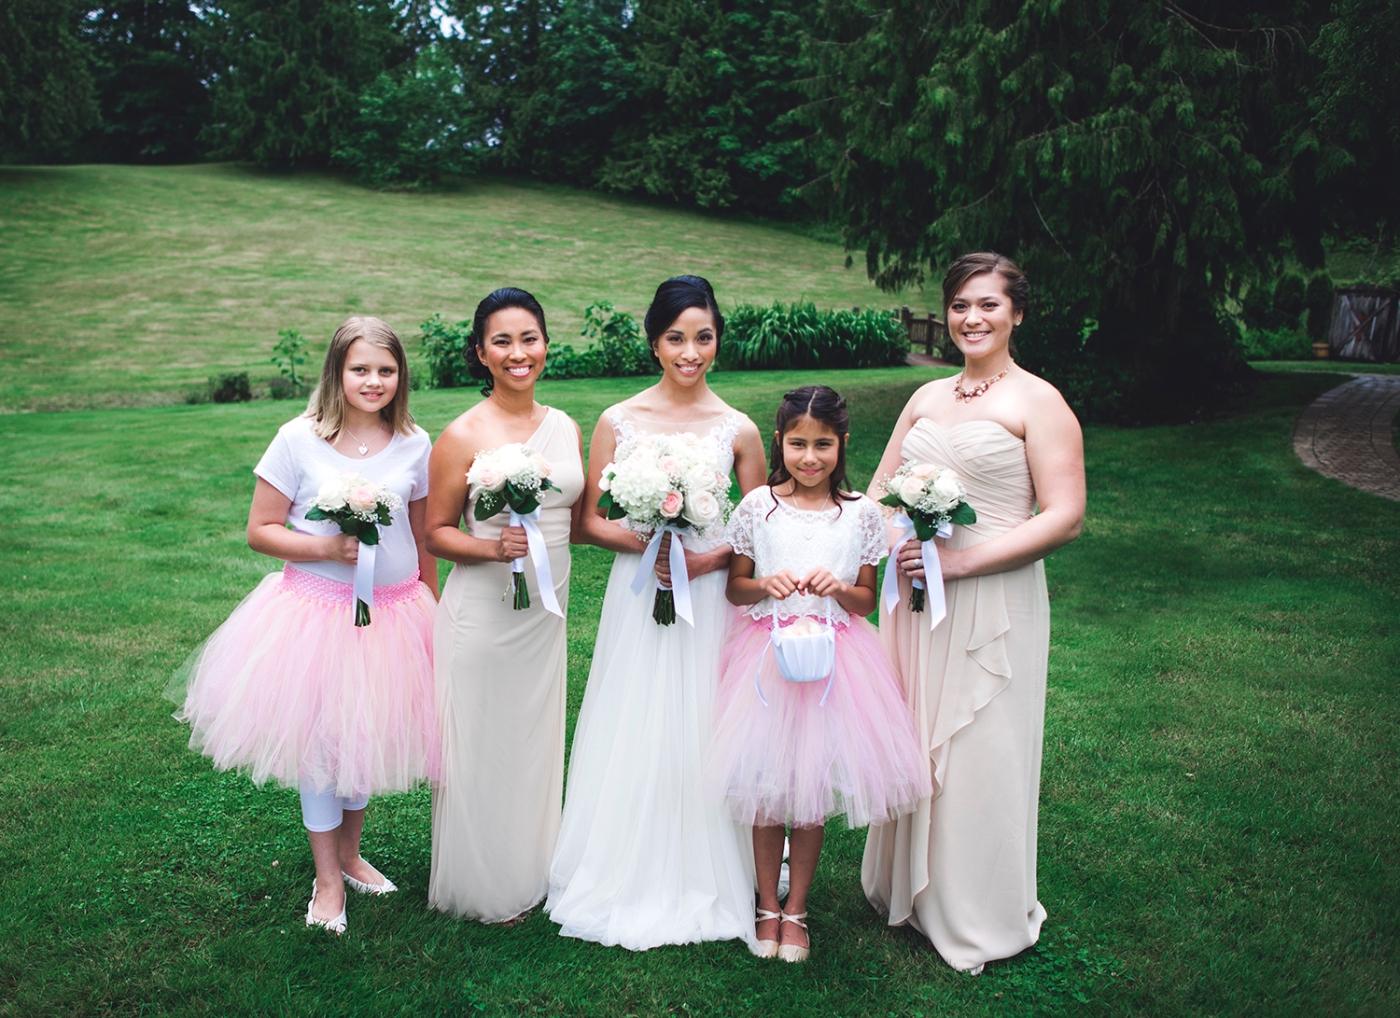 Jane_Speleers_2016_Family_Wedding_Wild_Rose_Estates_Venue_ DSC_DSC_9888